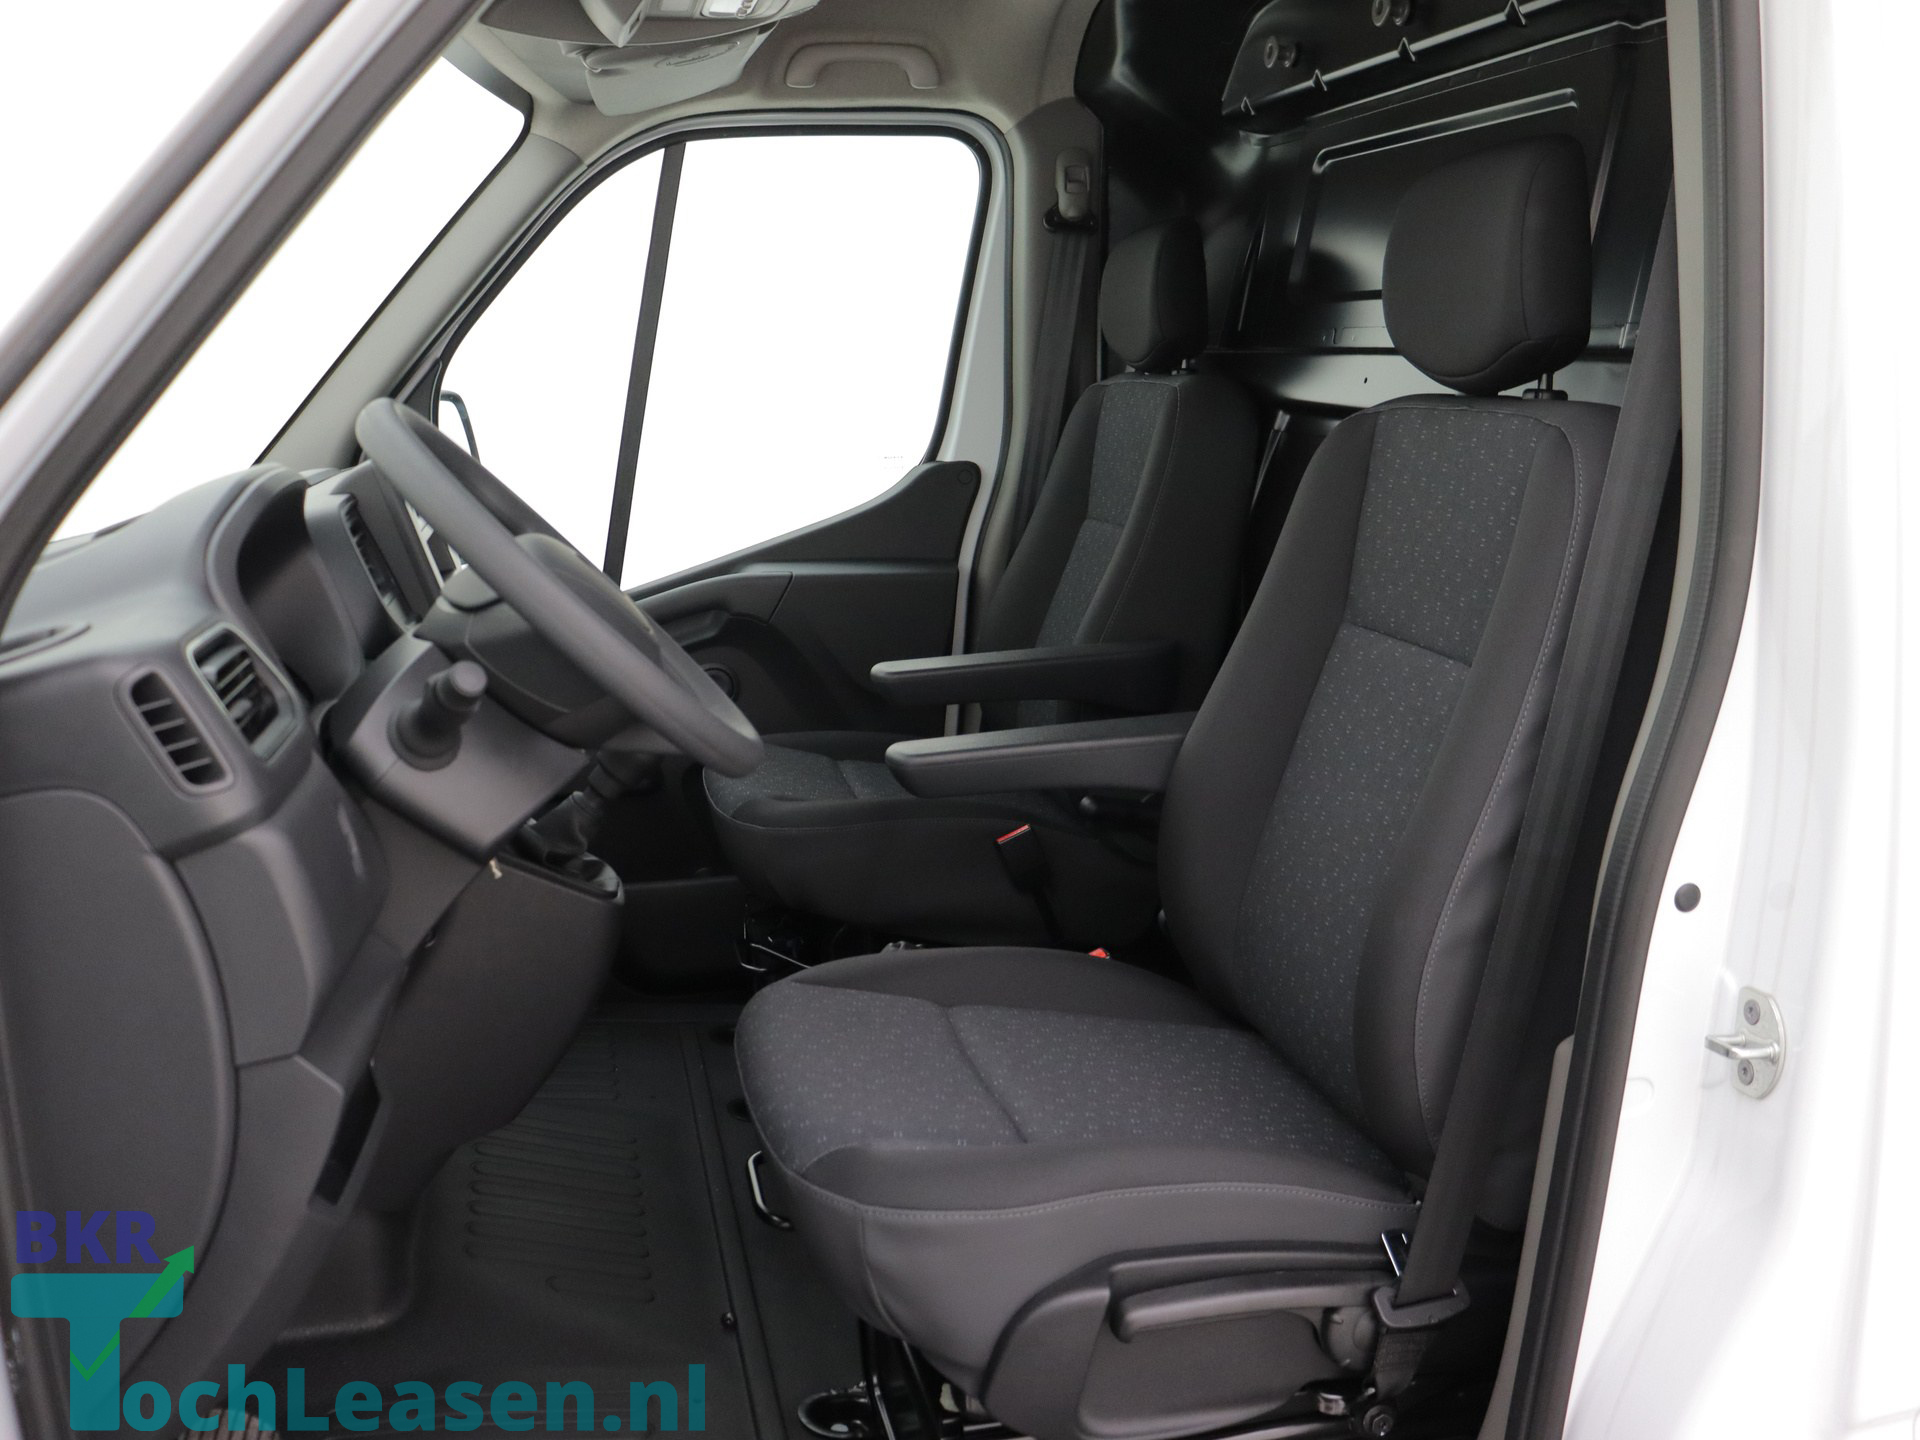 BKRTochLeasen.nl - Opel Movano - L3H2 - wit 10